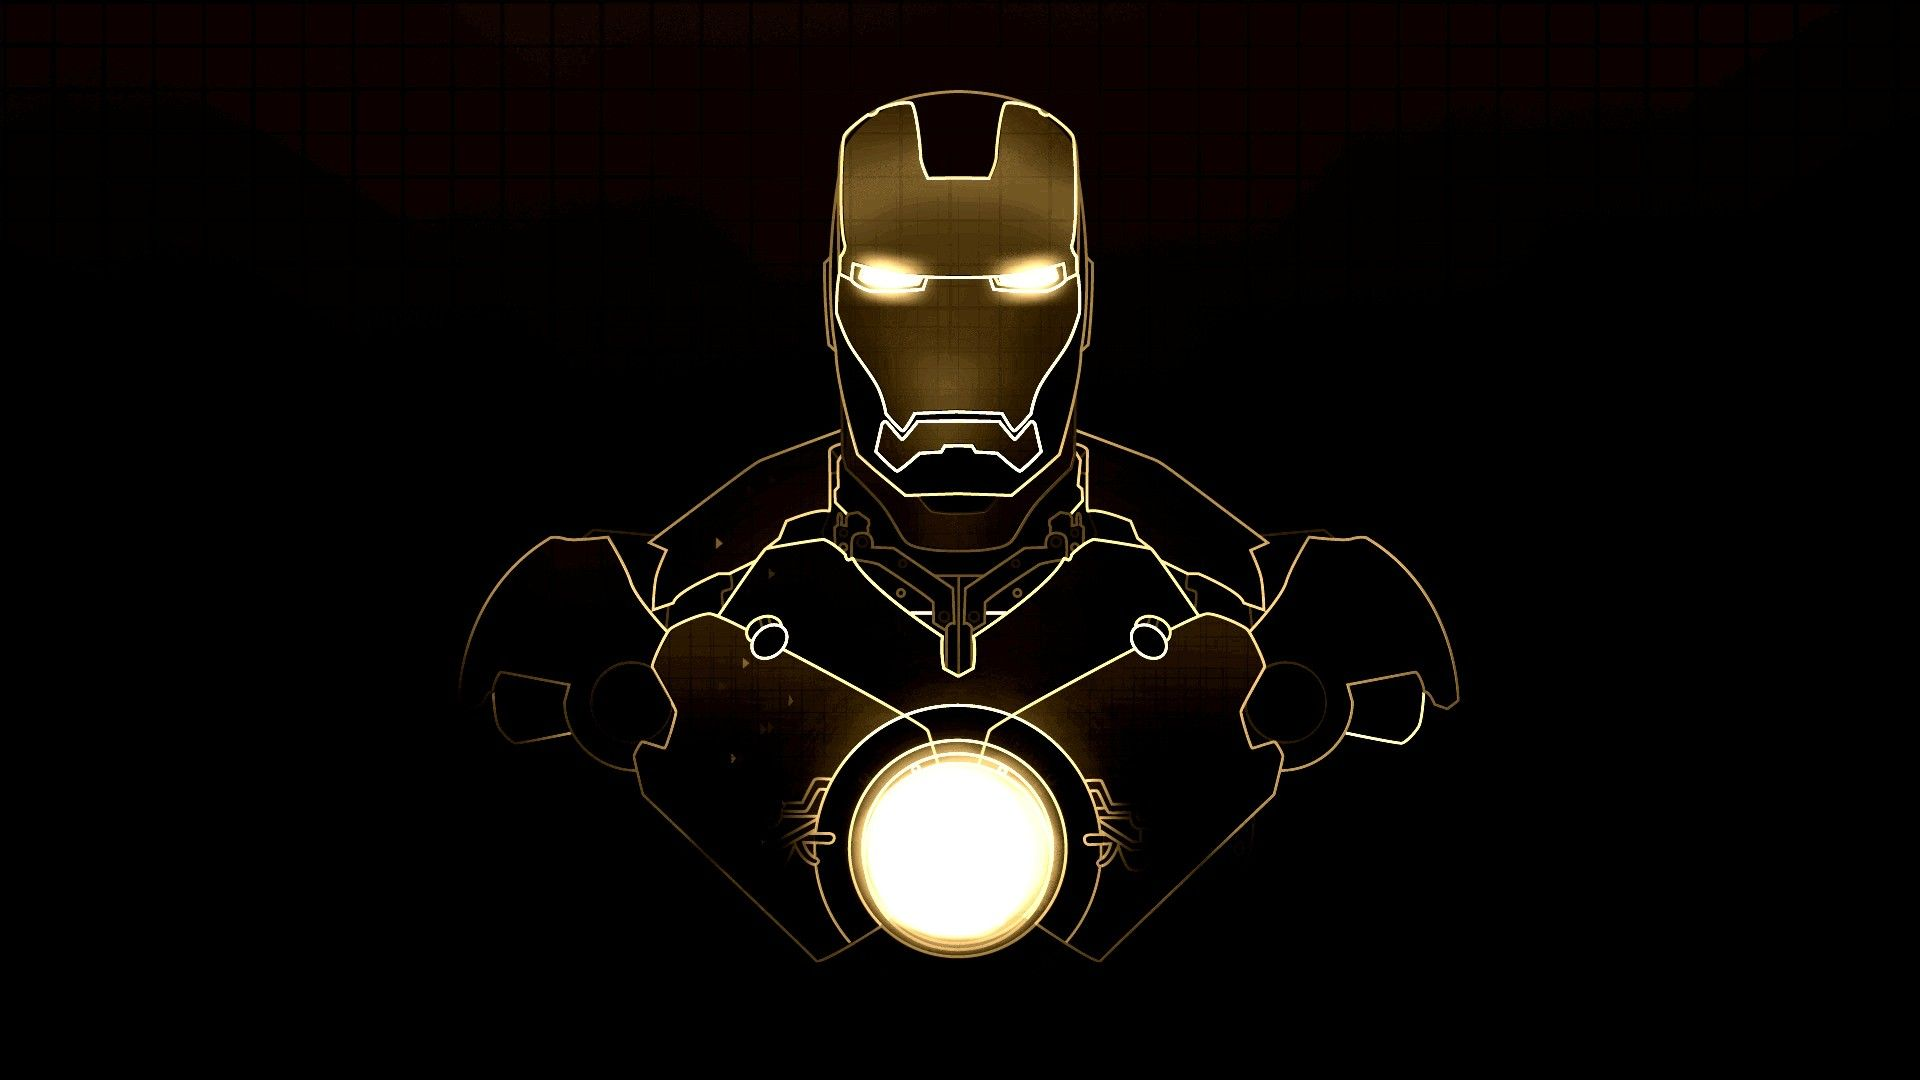 Iron Man Wallpaper Iphone 5 Iron Man Wallpaper Iphone 5